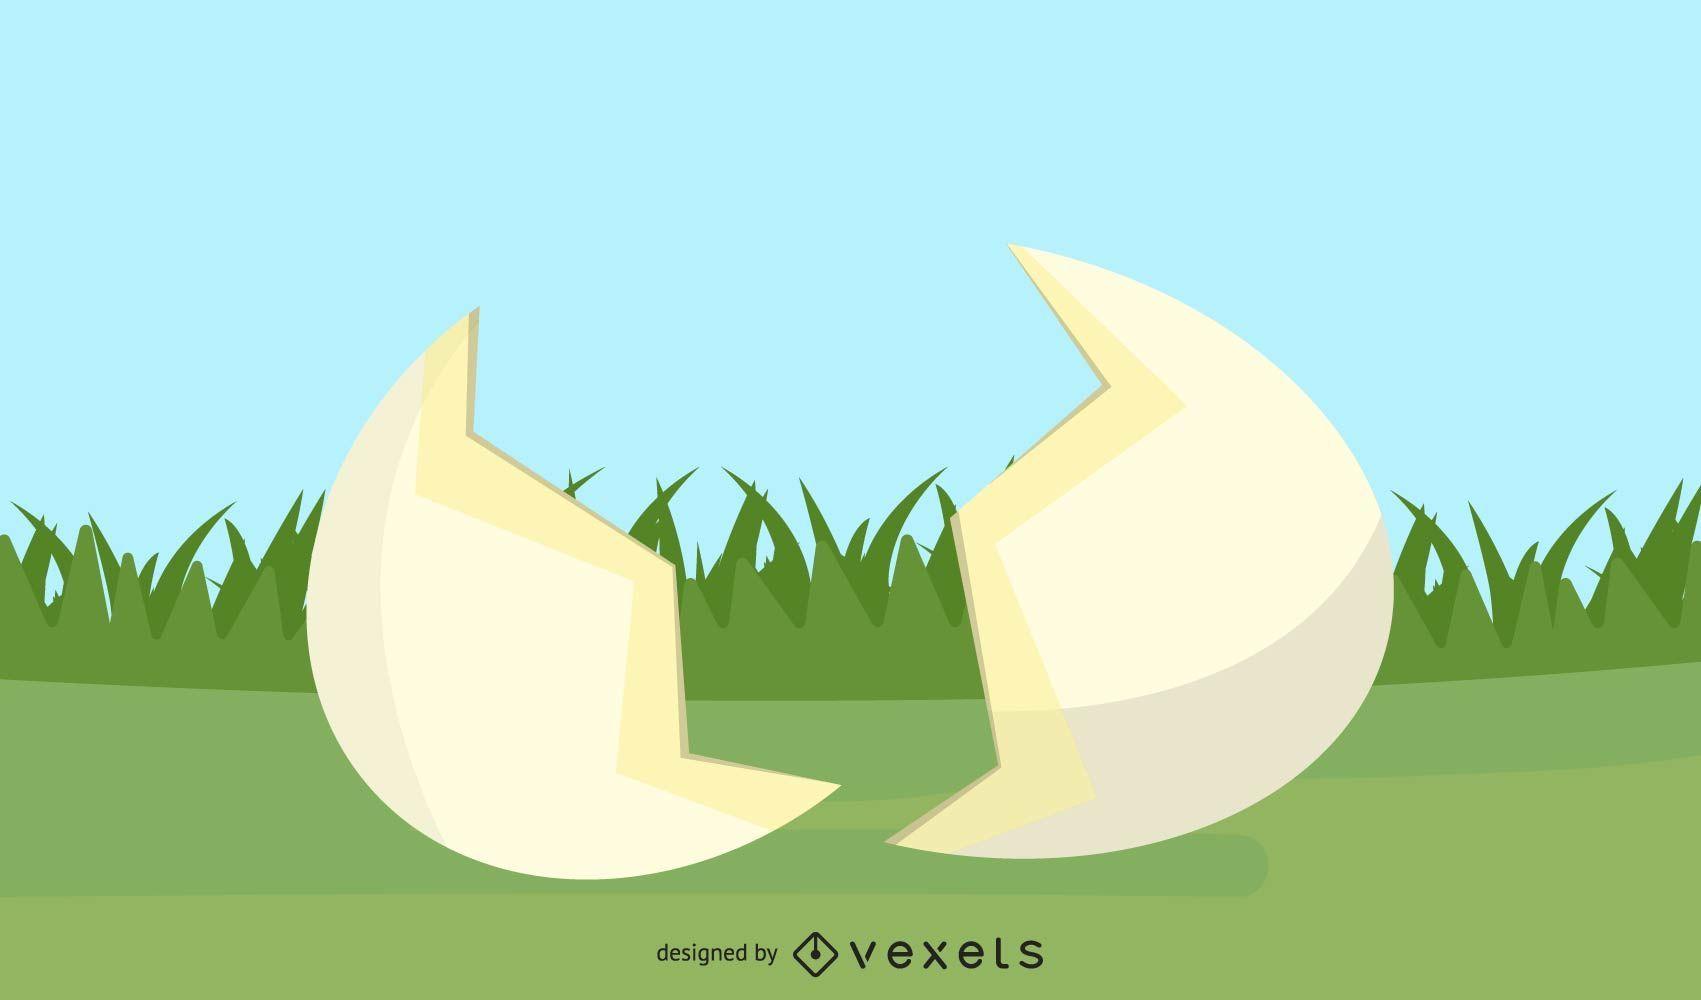 Huevo roto y pasto